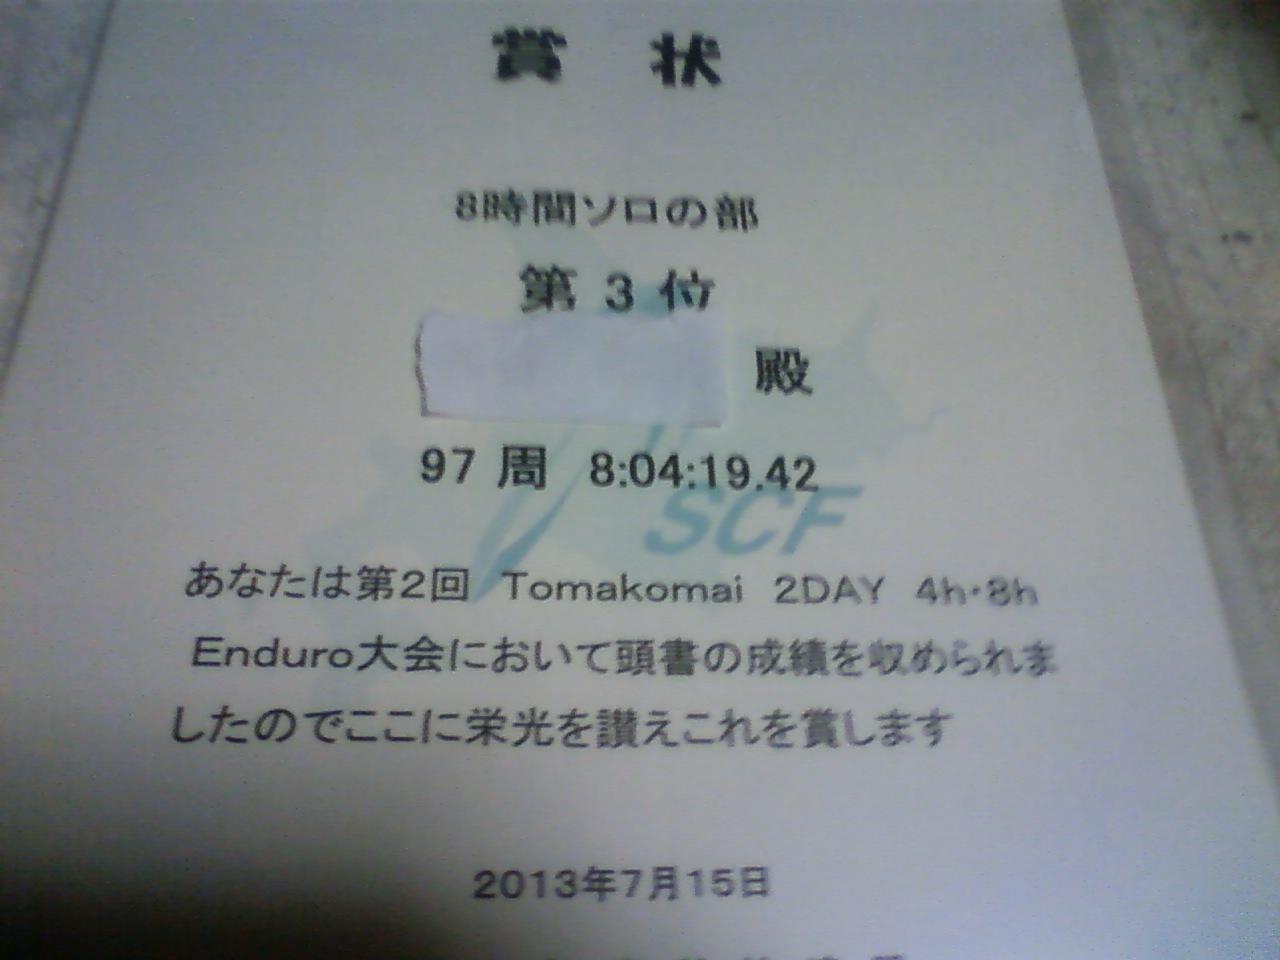 Ts3k0165